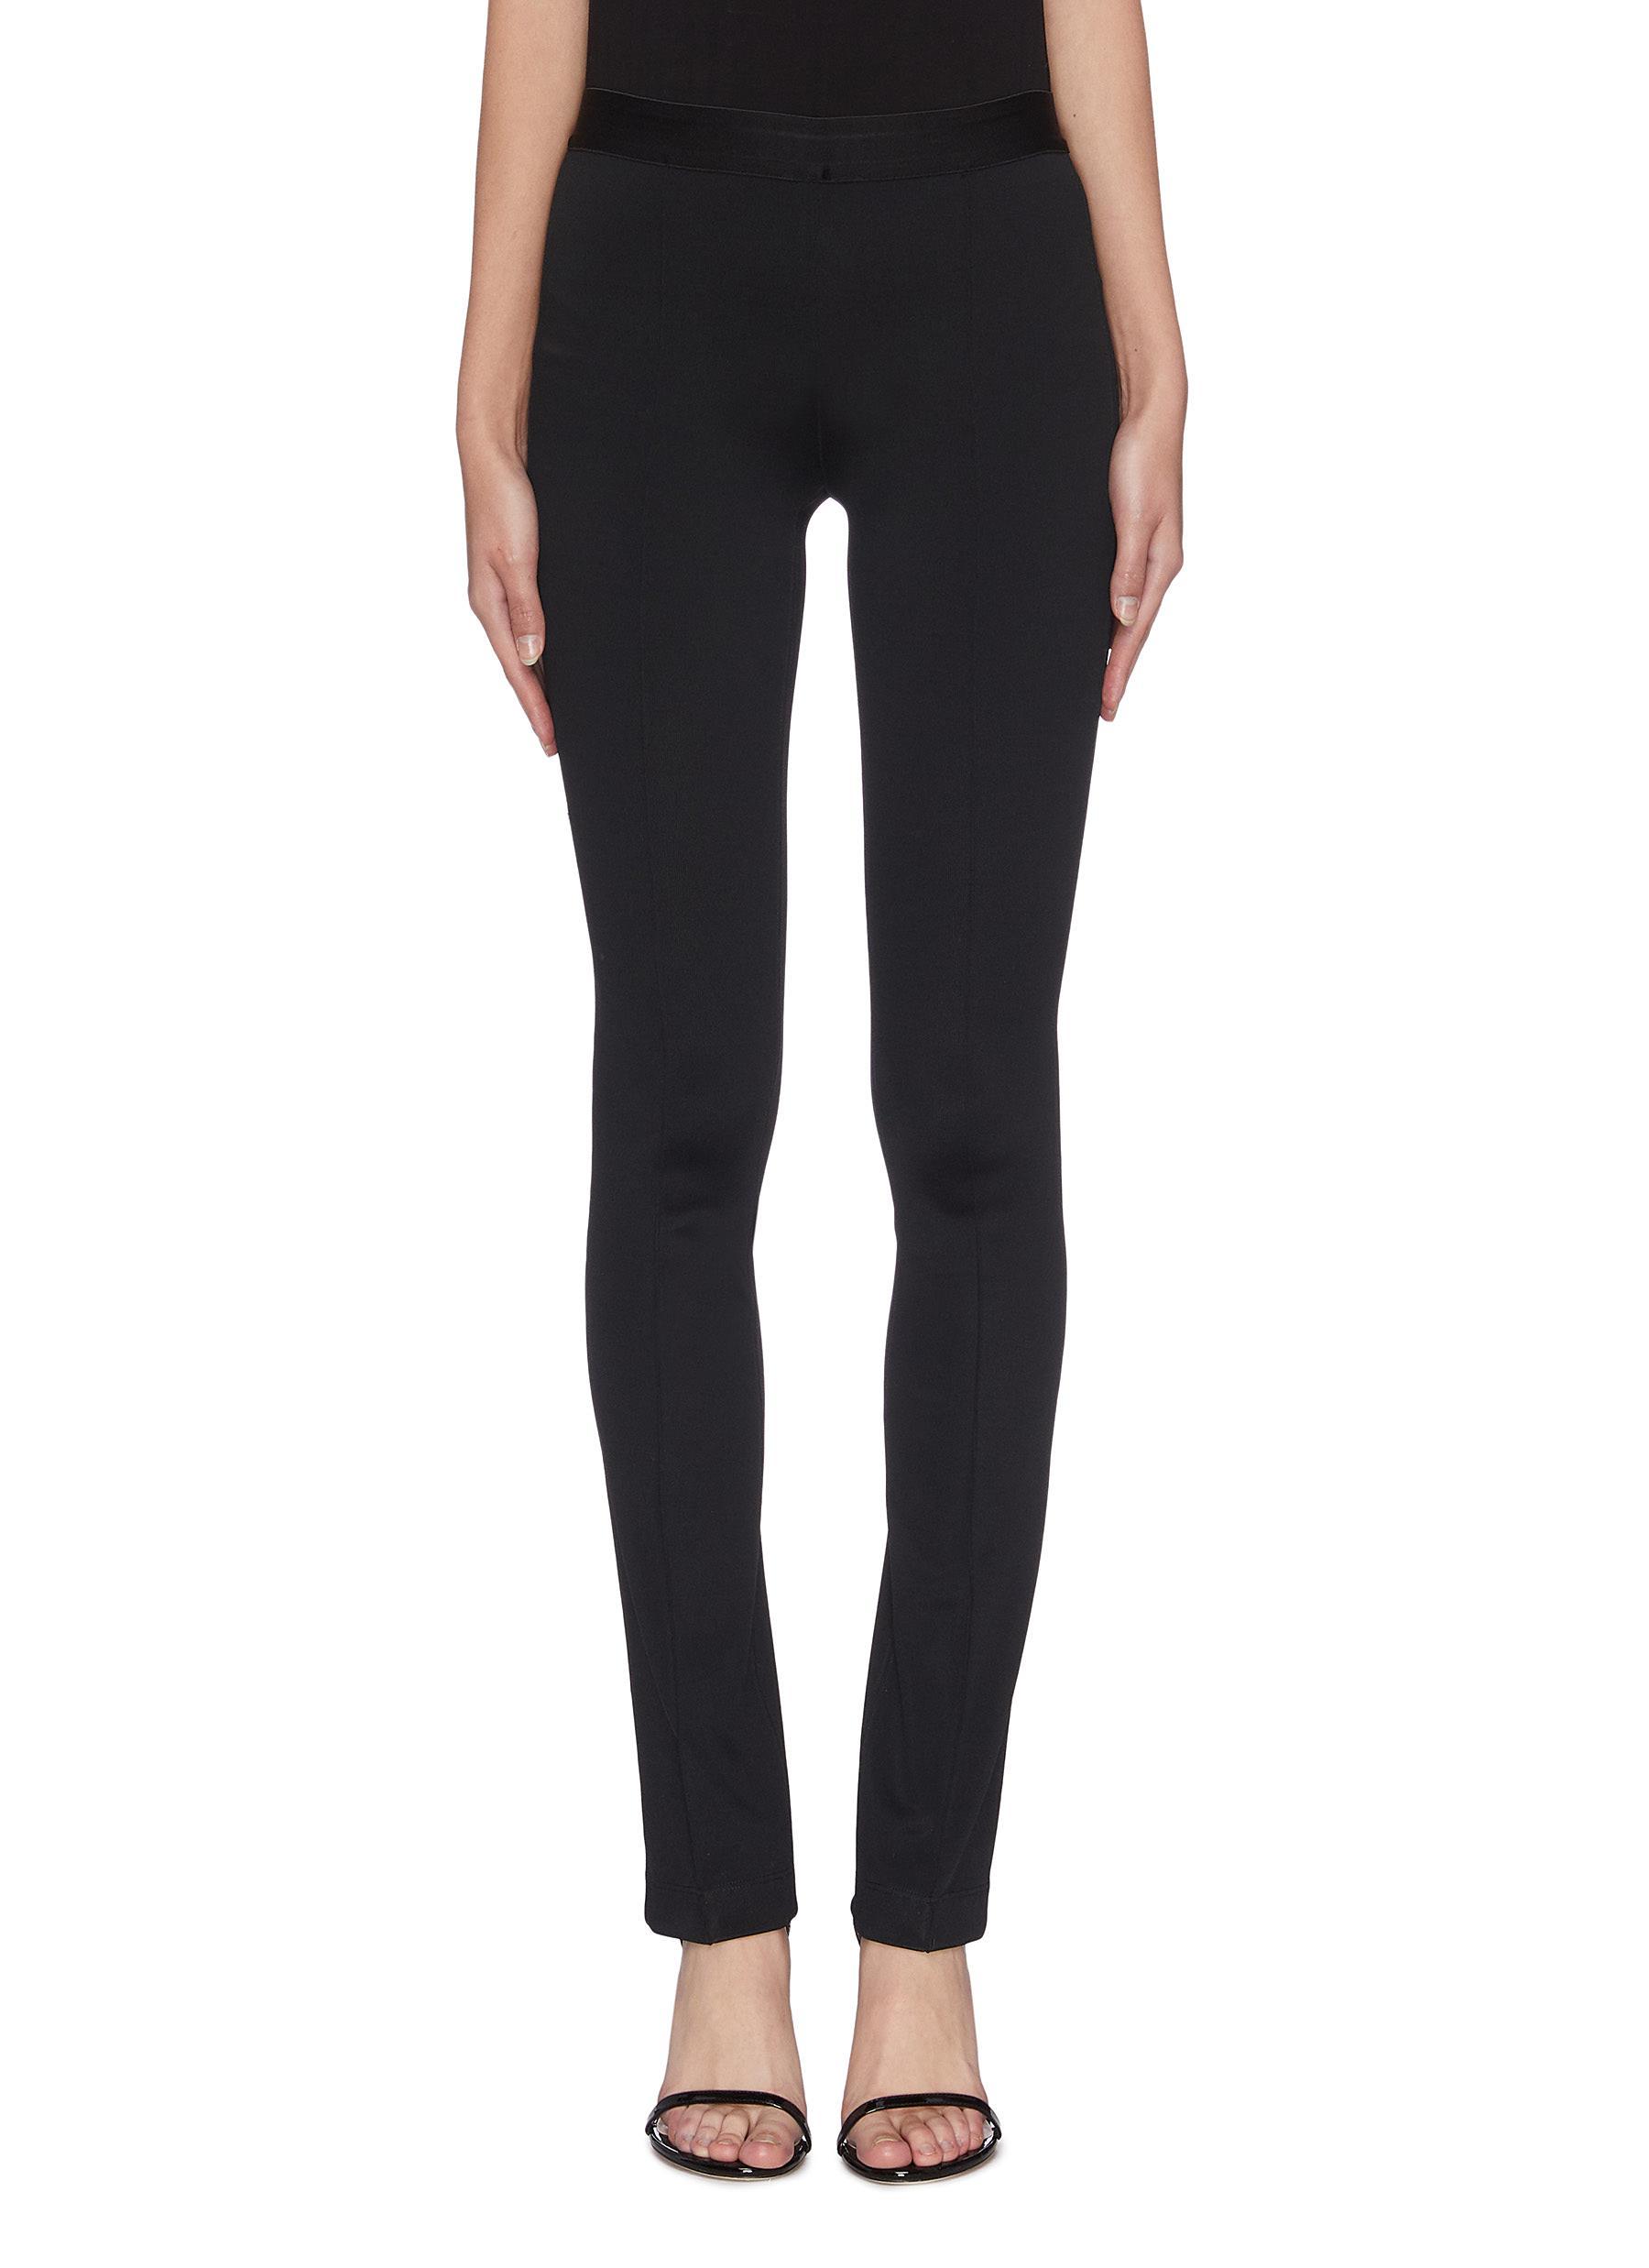 Buy Helmut Lang Pants & Shorts Elastic waistband flared leggings